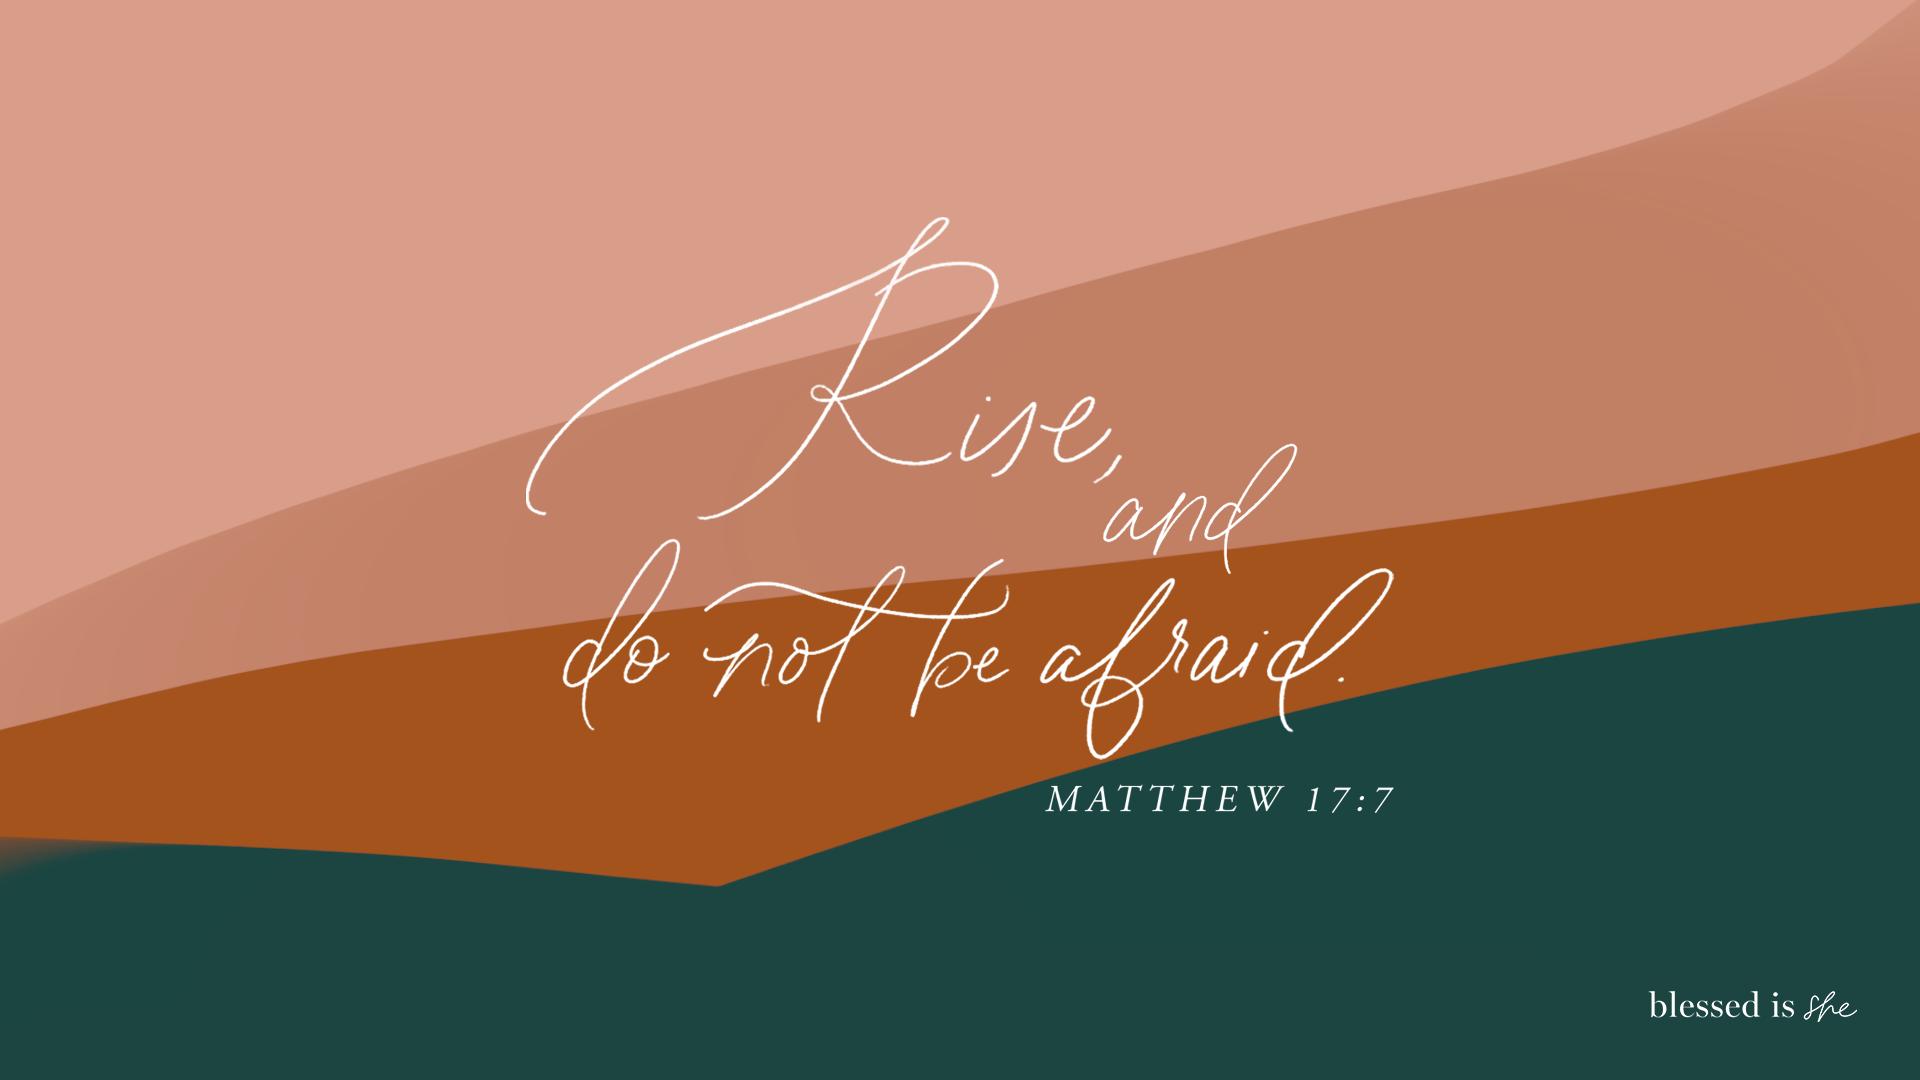 Wallpaper For Laptop Bible Verse